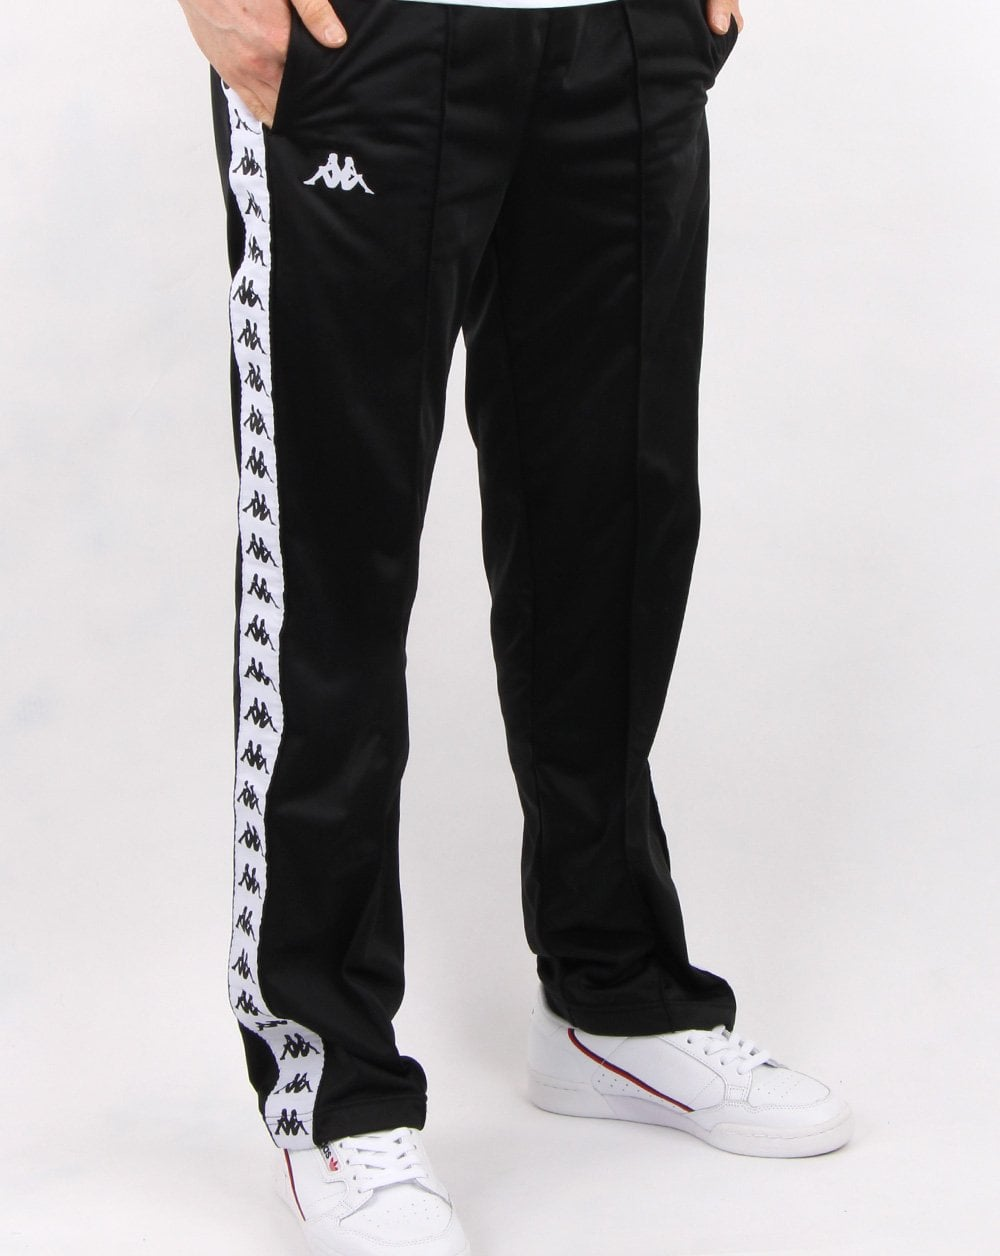 7169ce45af Kappa Astoria Track Pants Black/white